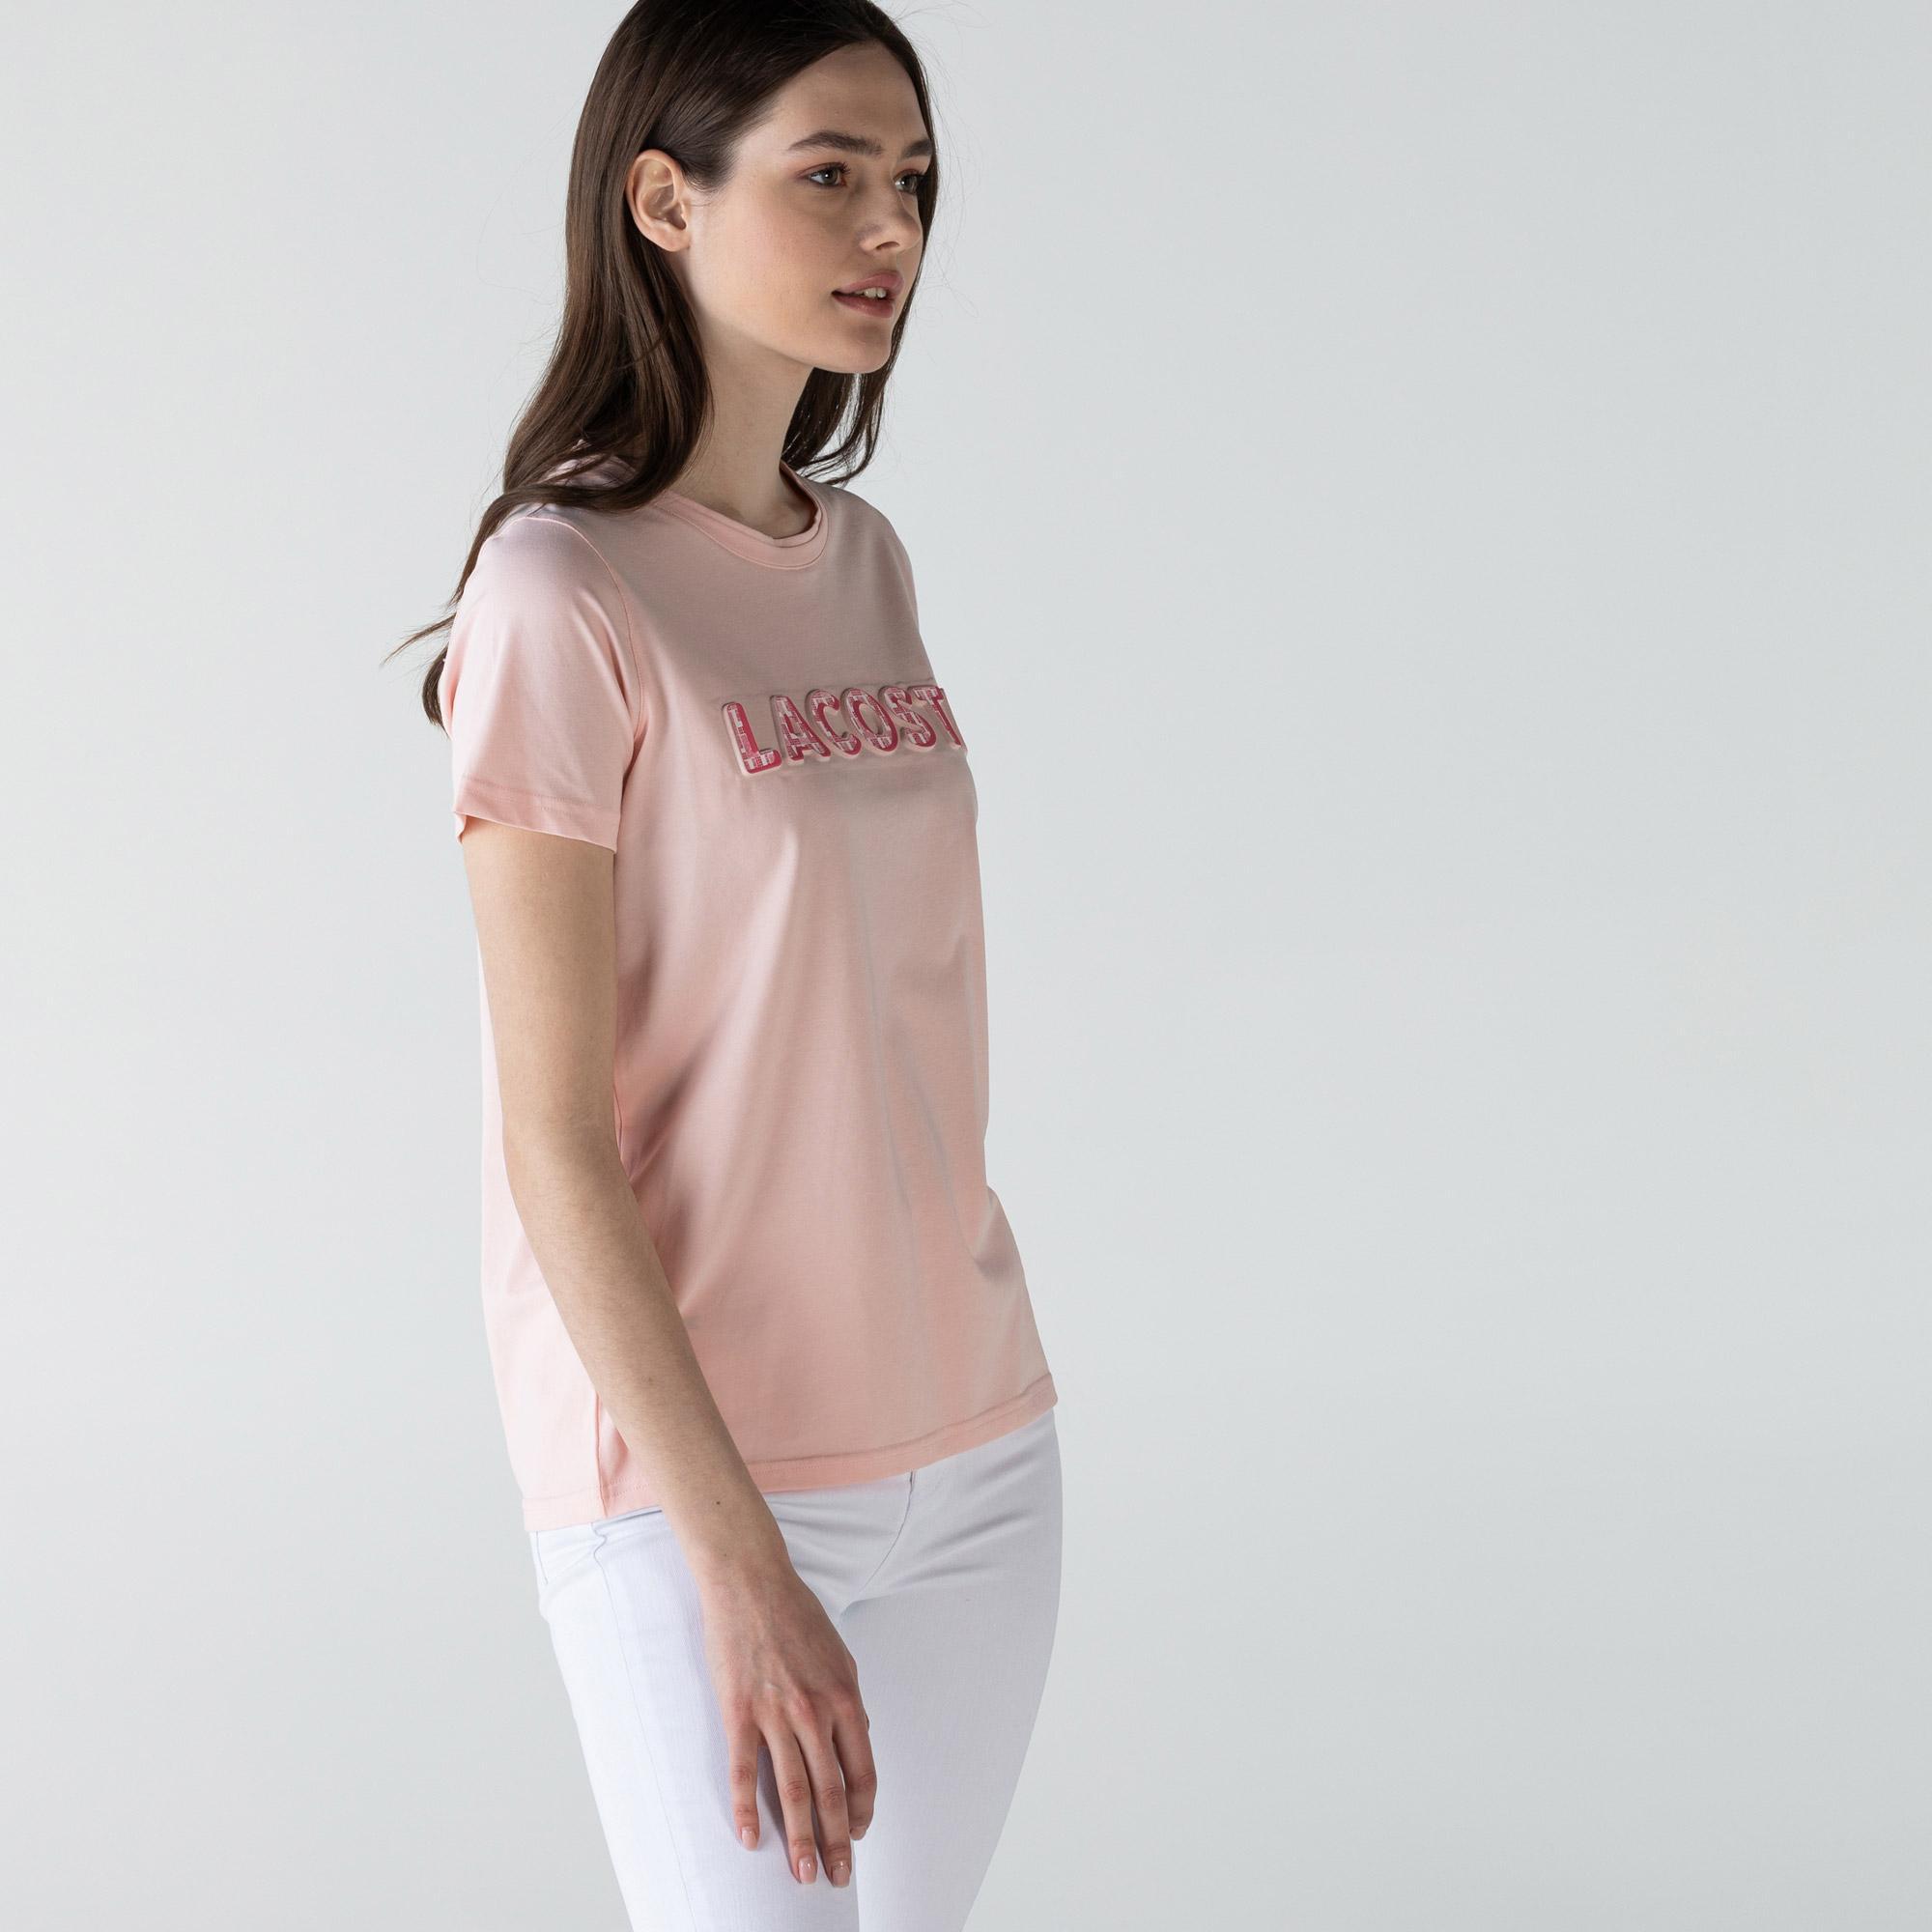 Lacoste Kadın Slim Fit Bisiklet Yaka Baskılı Pembe T-Shirt